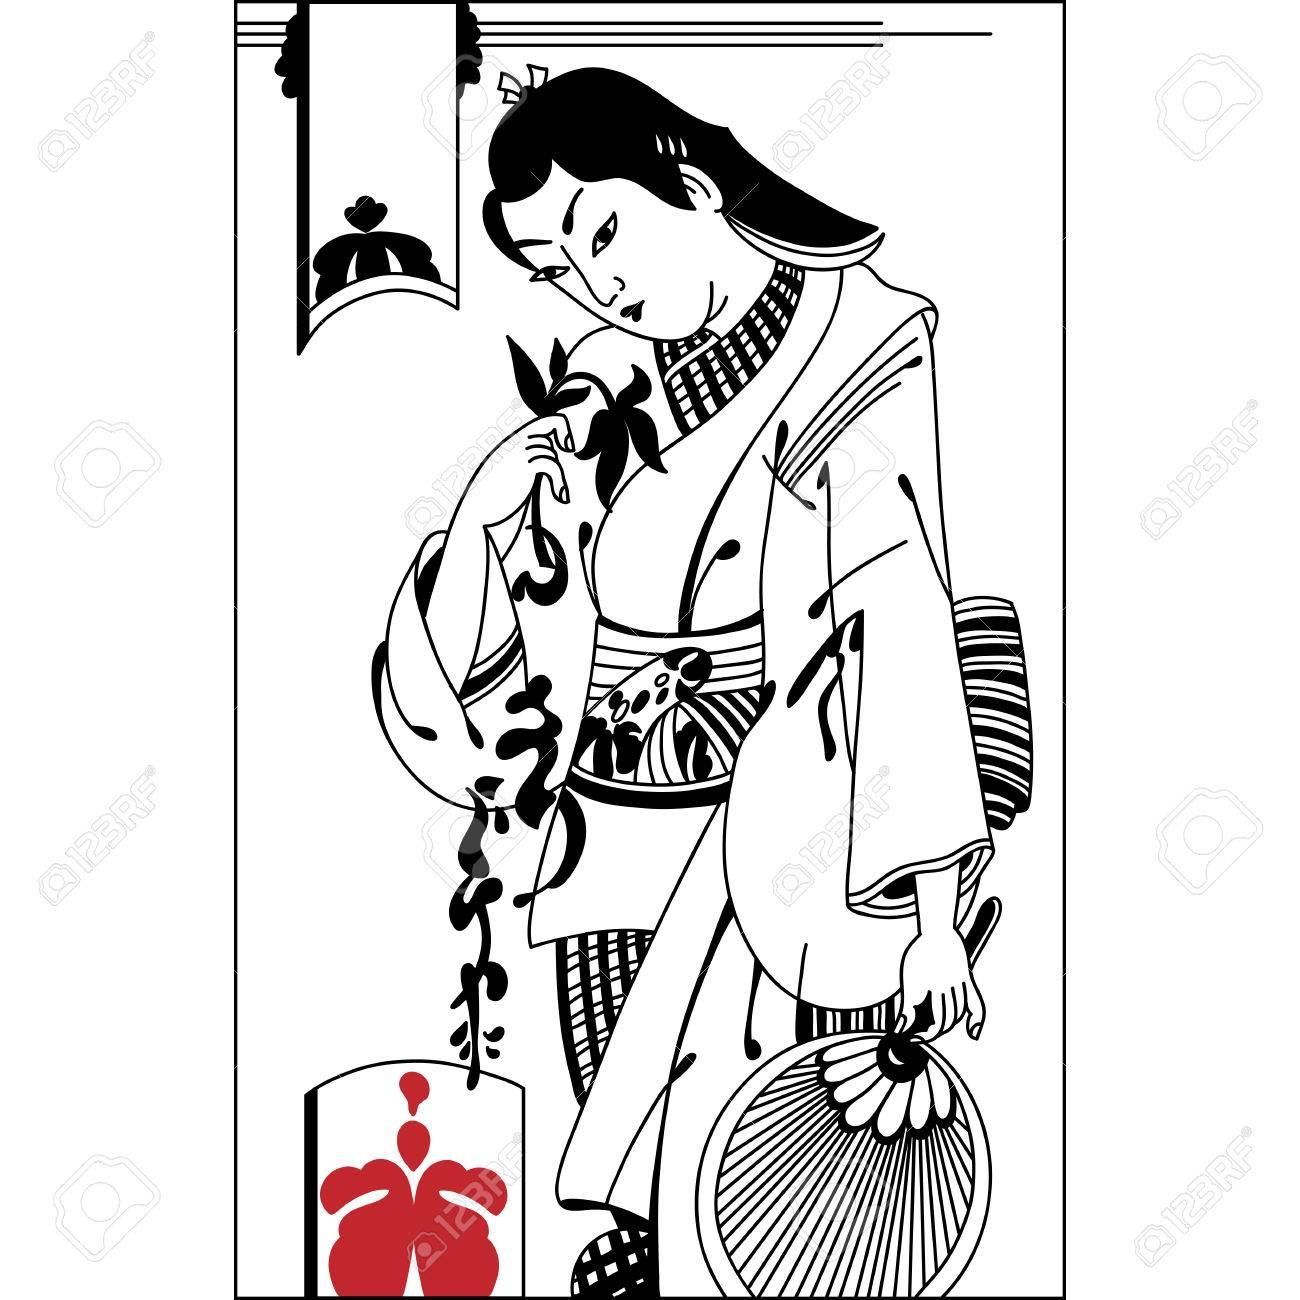 Broken Heart The Illustration Of Sad Samurai Vintage Hand Draw